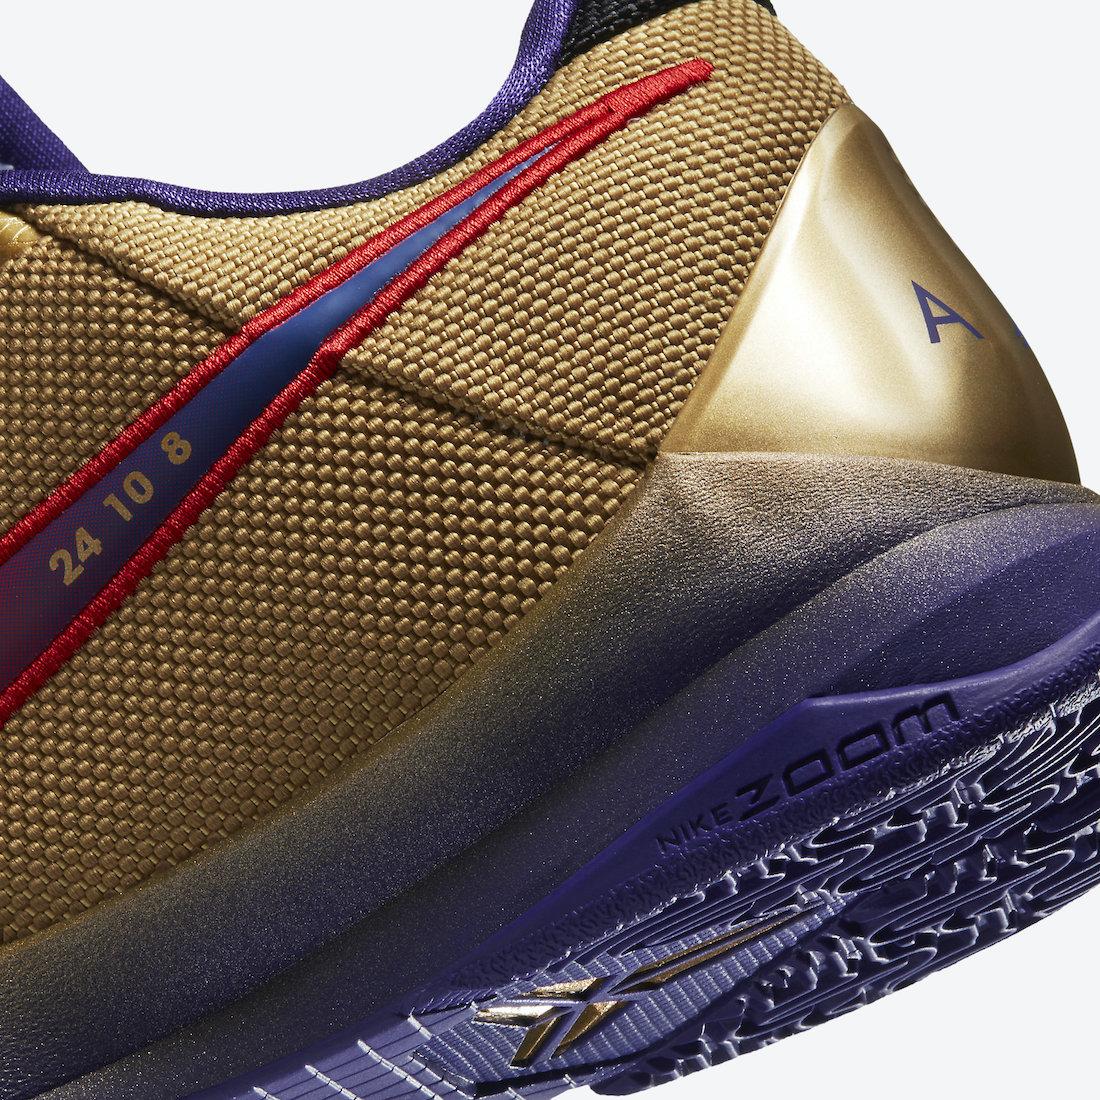 Undefeated-Nike-Kobe-5-Protro-Hall-of-Fame-DA6809-700-Release-Date-7